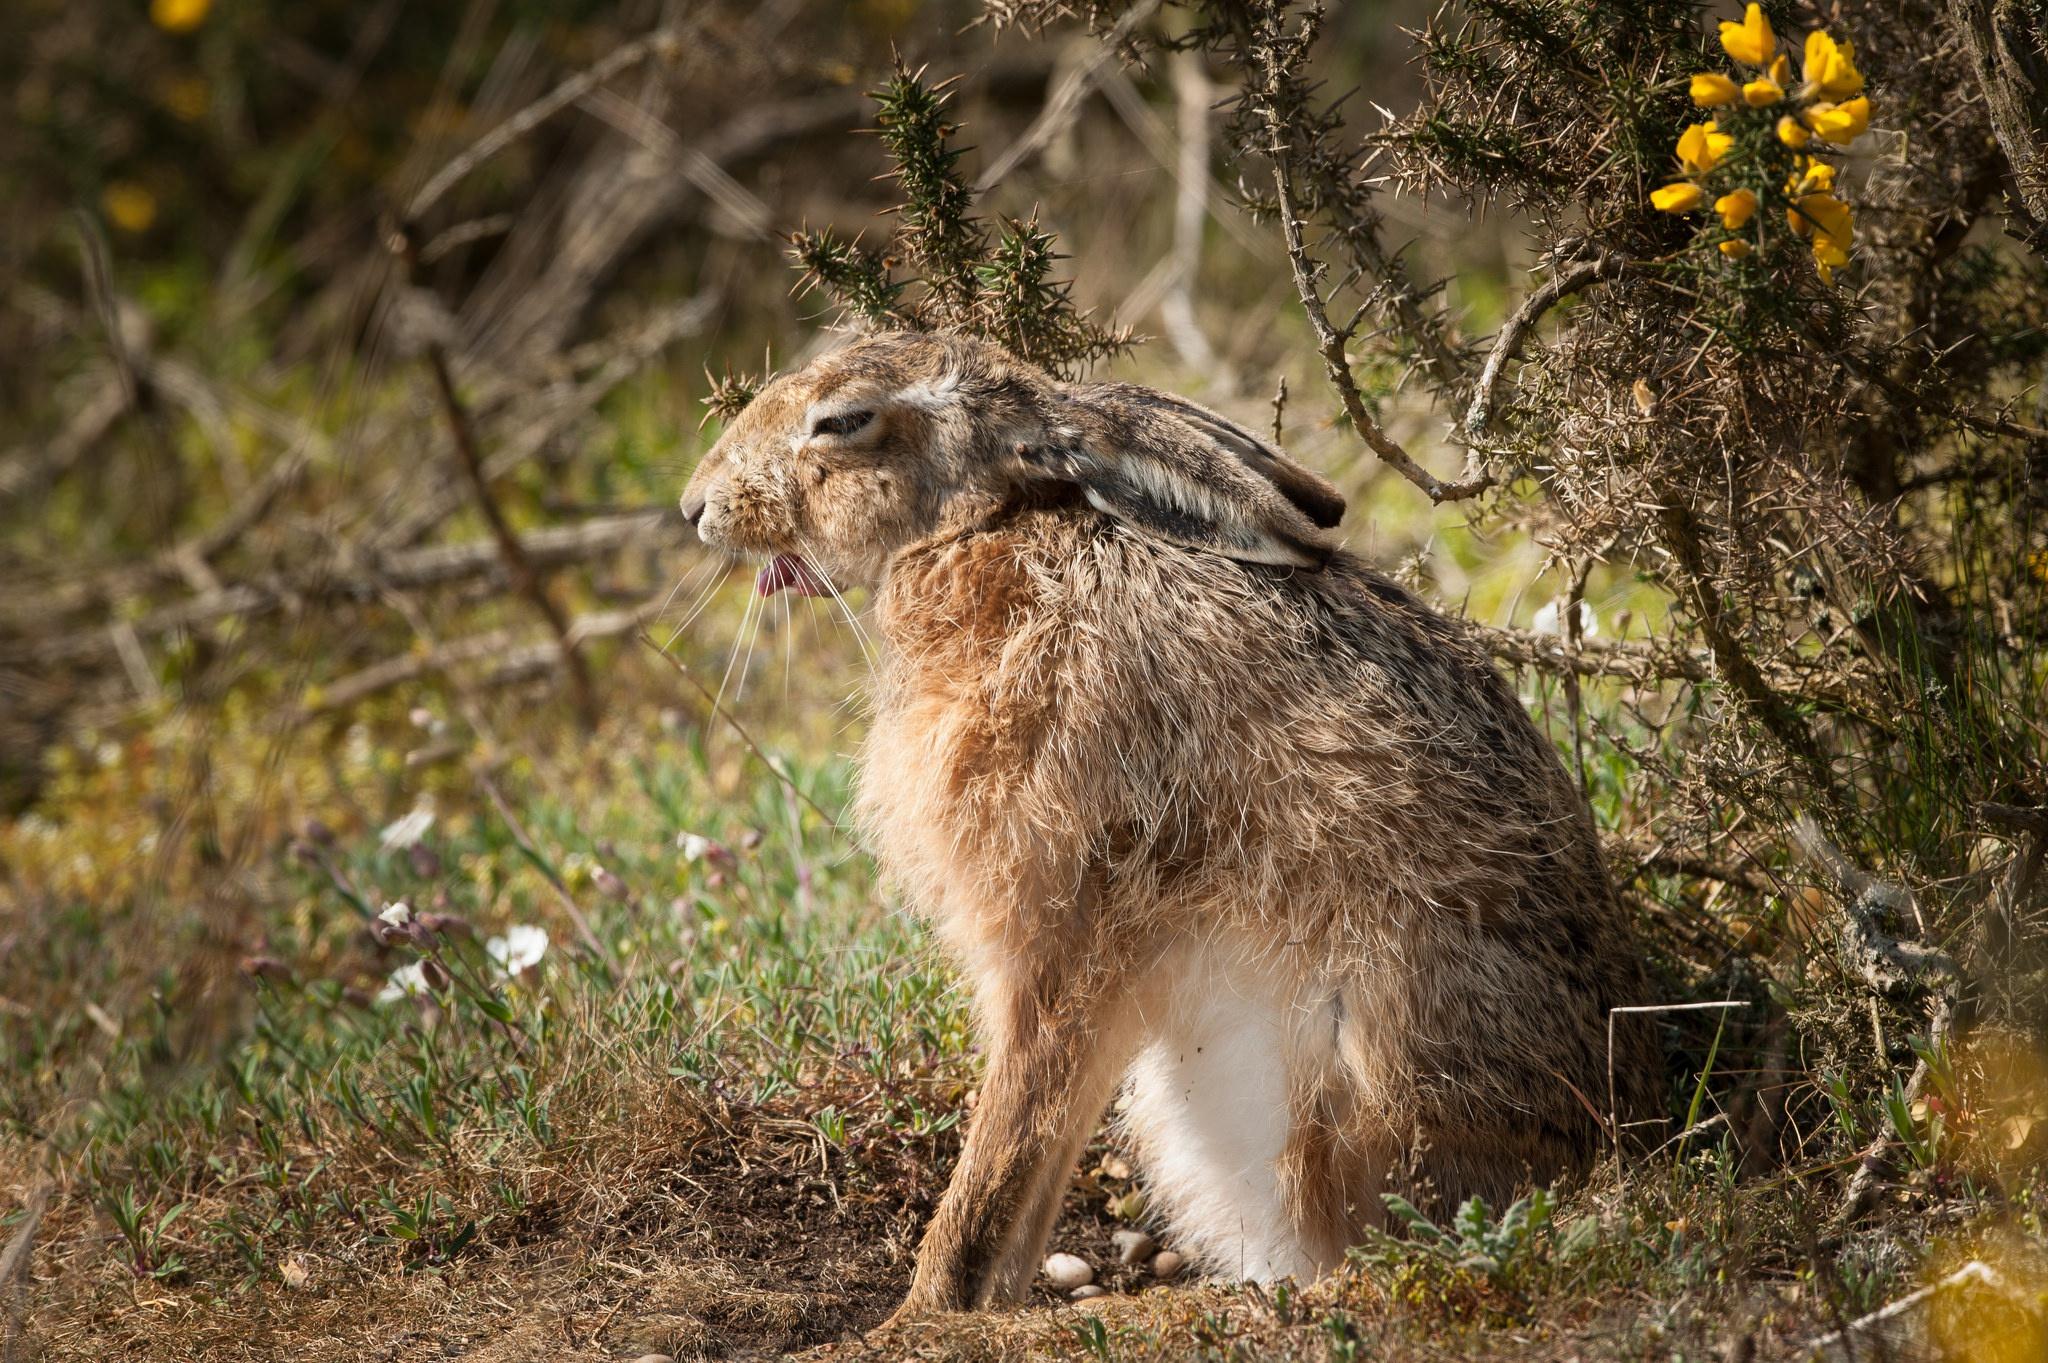 природа животные заяц nature animals hare  № 103316 загрузить